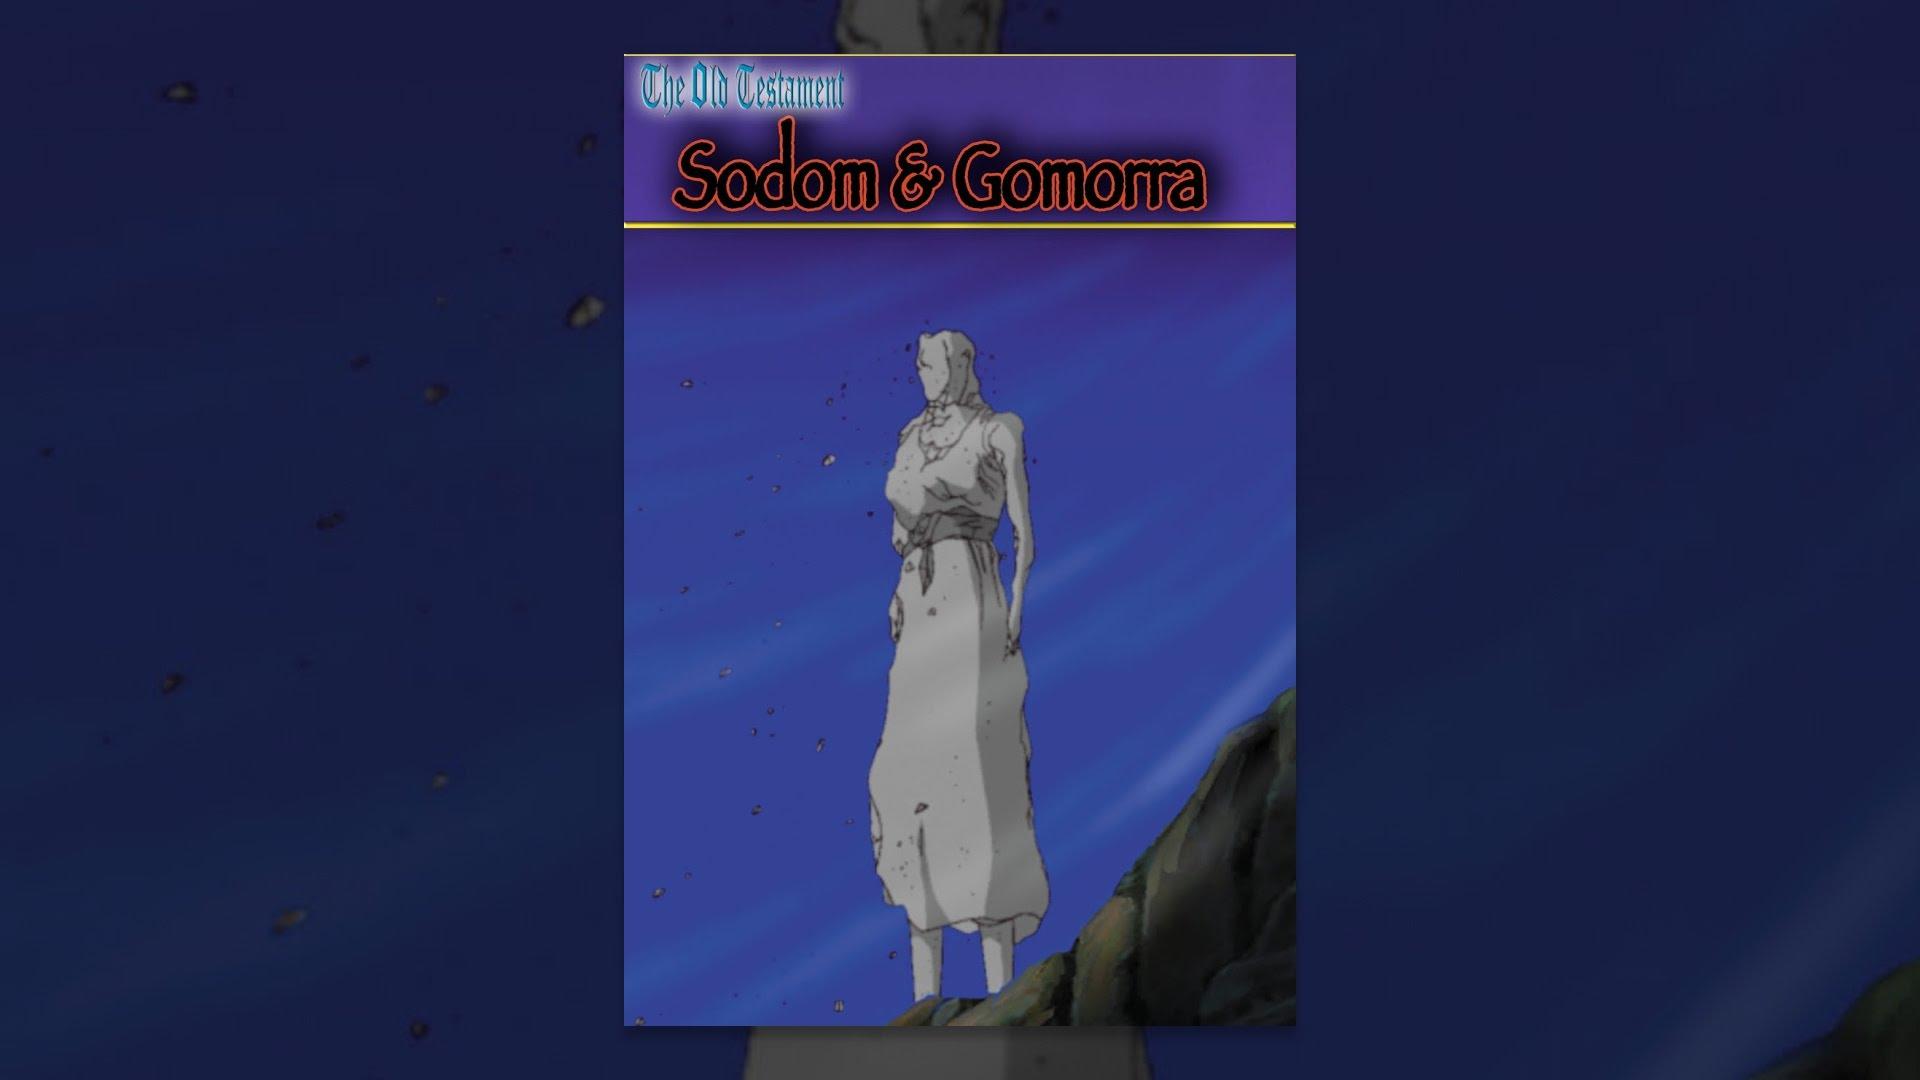 Old Testament I, Sodom & Gomorrah: An Animated Classic